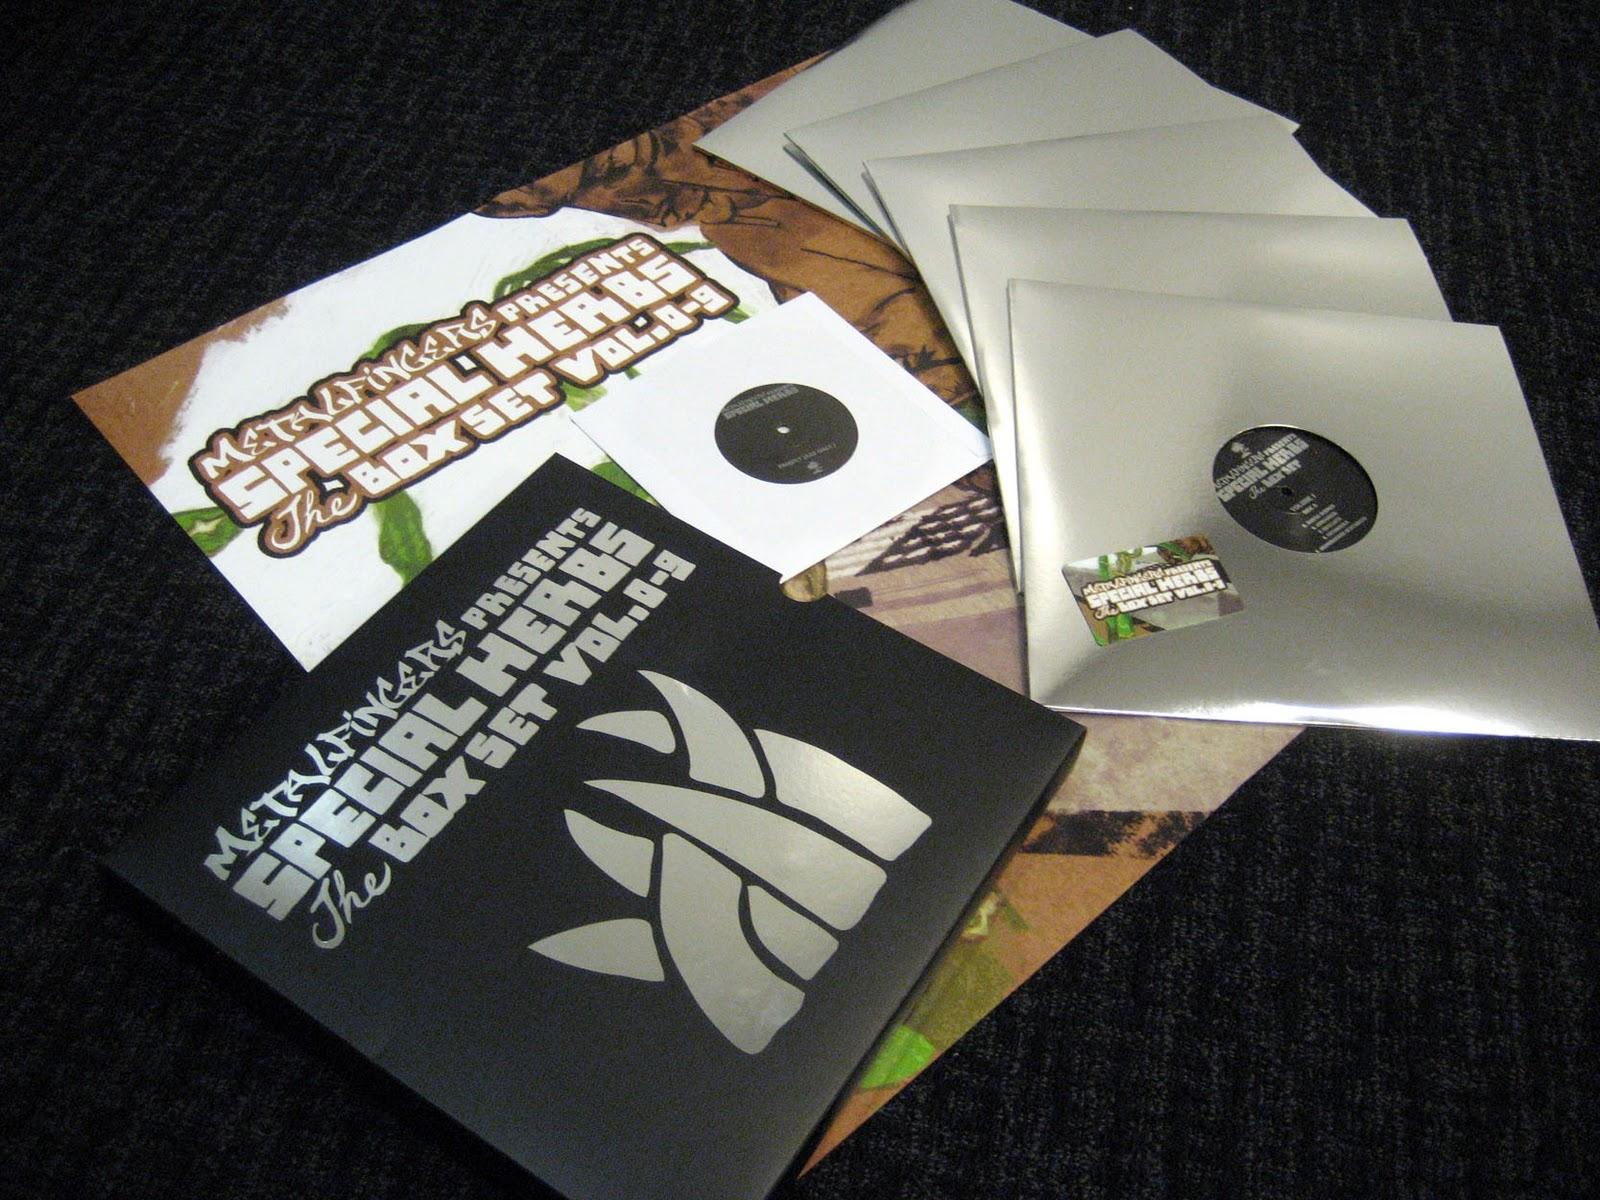 mf doom special herbs box set download